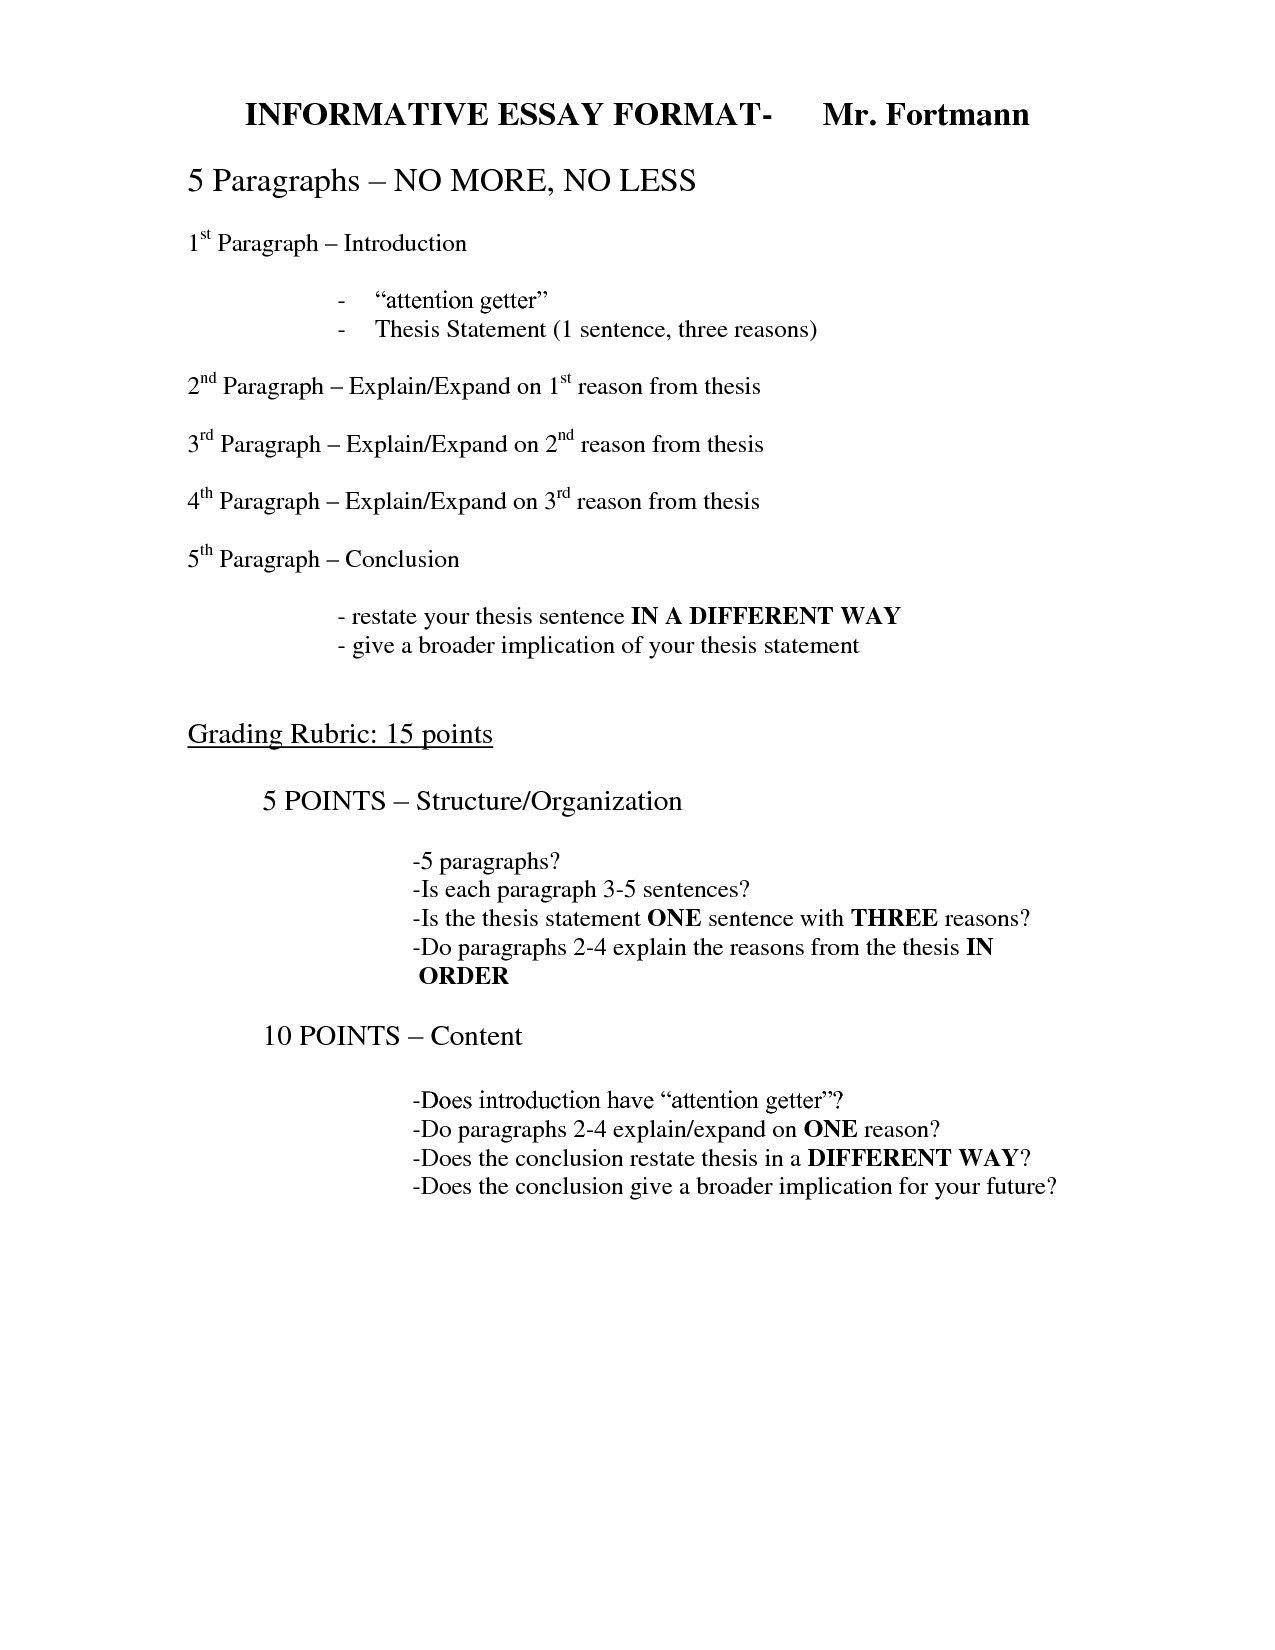 Sample Essay Outline Format Fresh Example Outline Essay New Examples In 3 Paragraph Essay Outline 20182001 Informative Essay Essay Outline Format Essay Outline